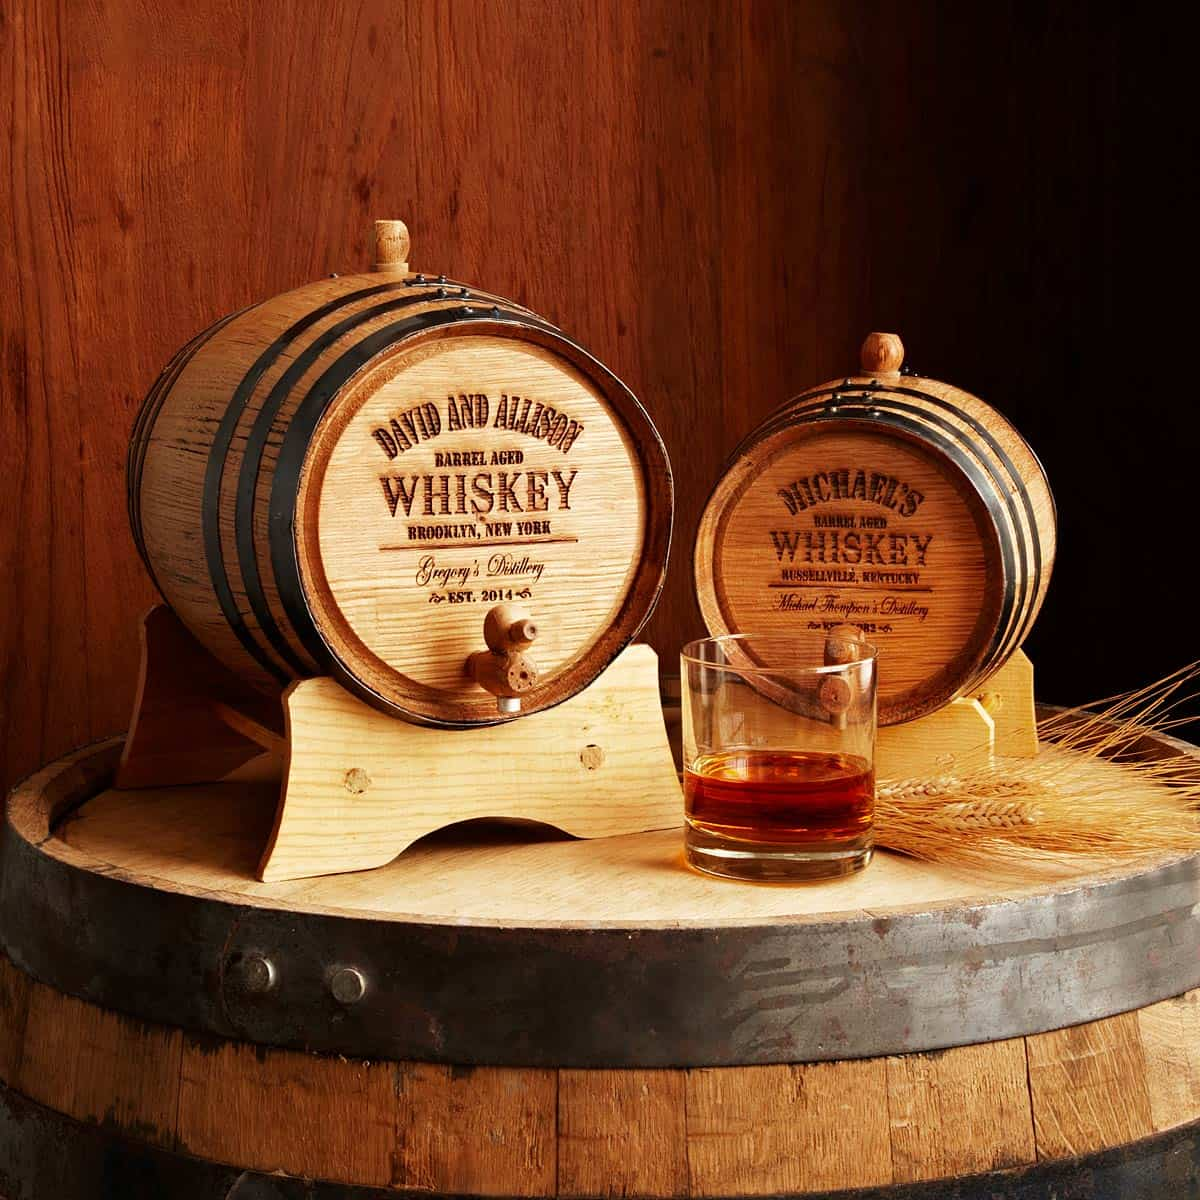 Personalized Whiskey Barrel – drinker gift